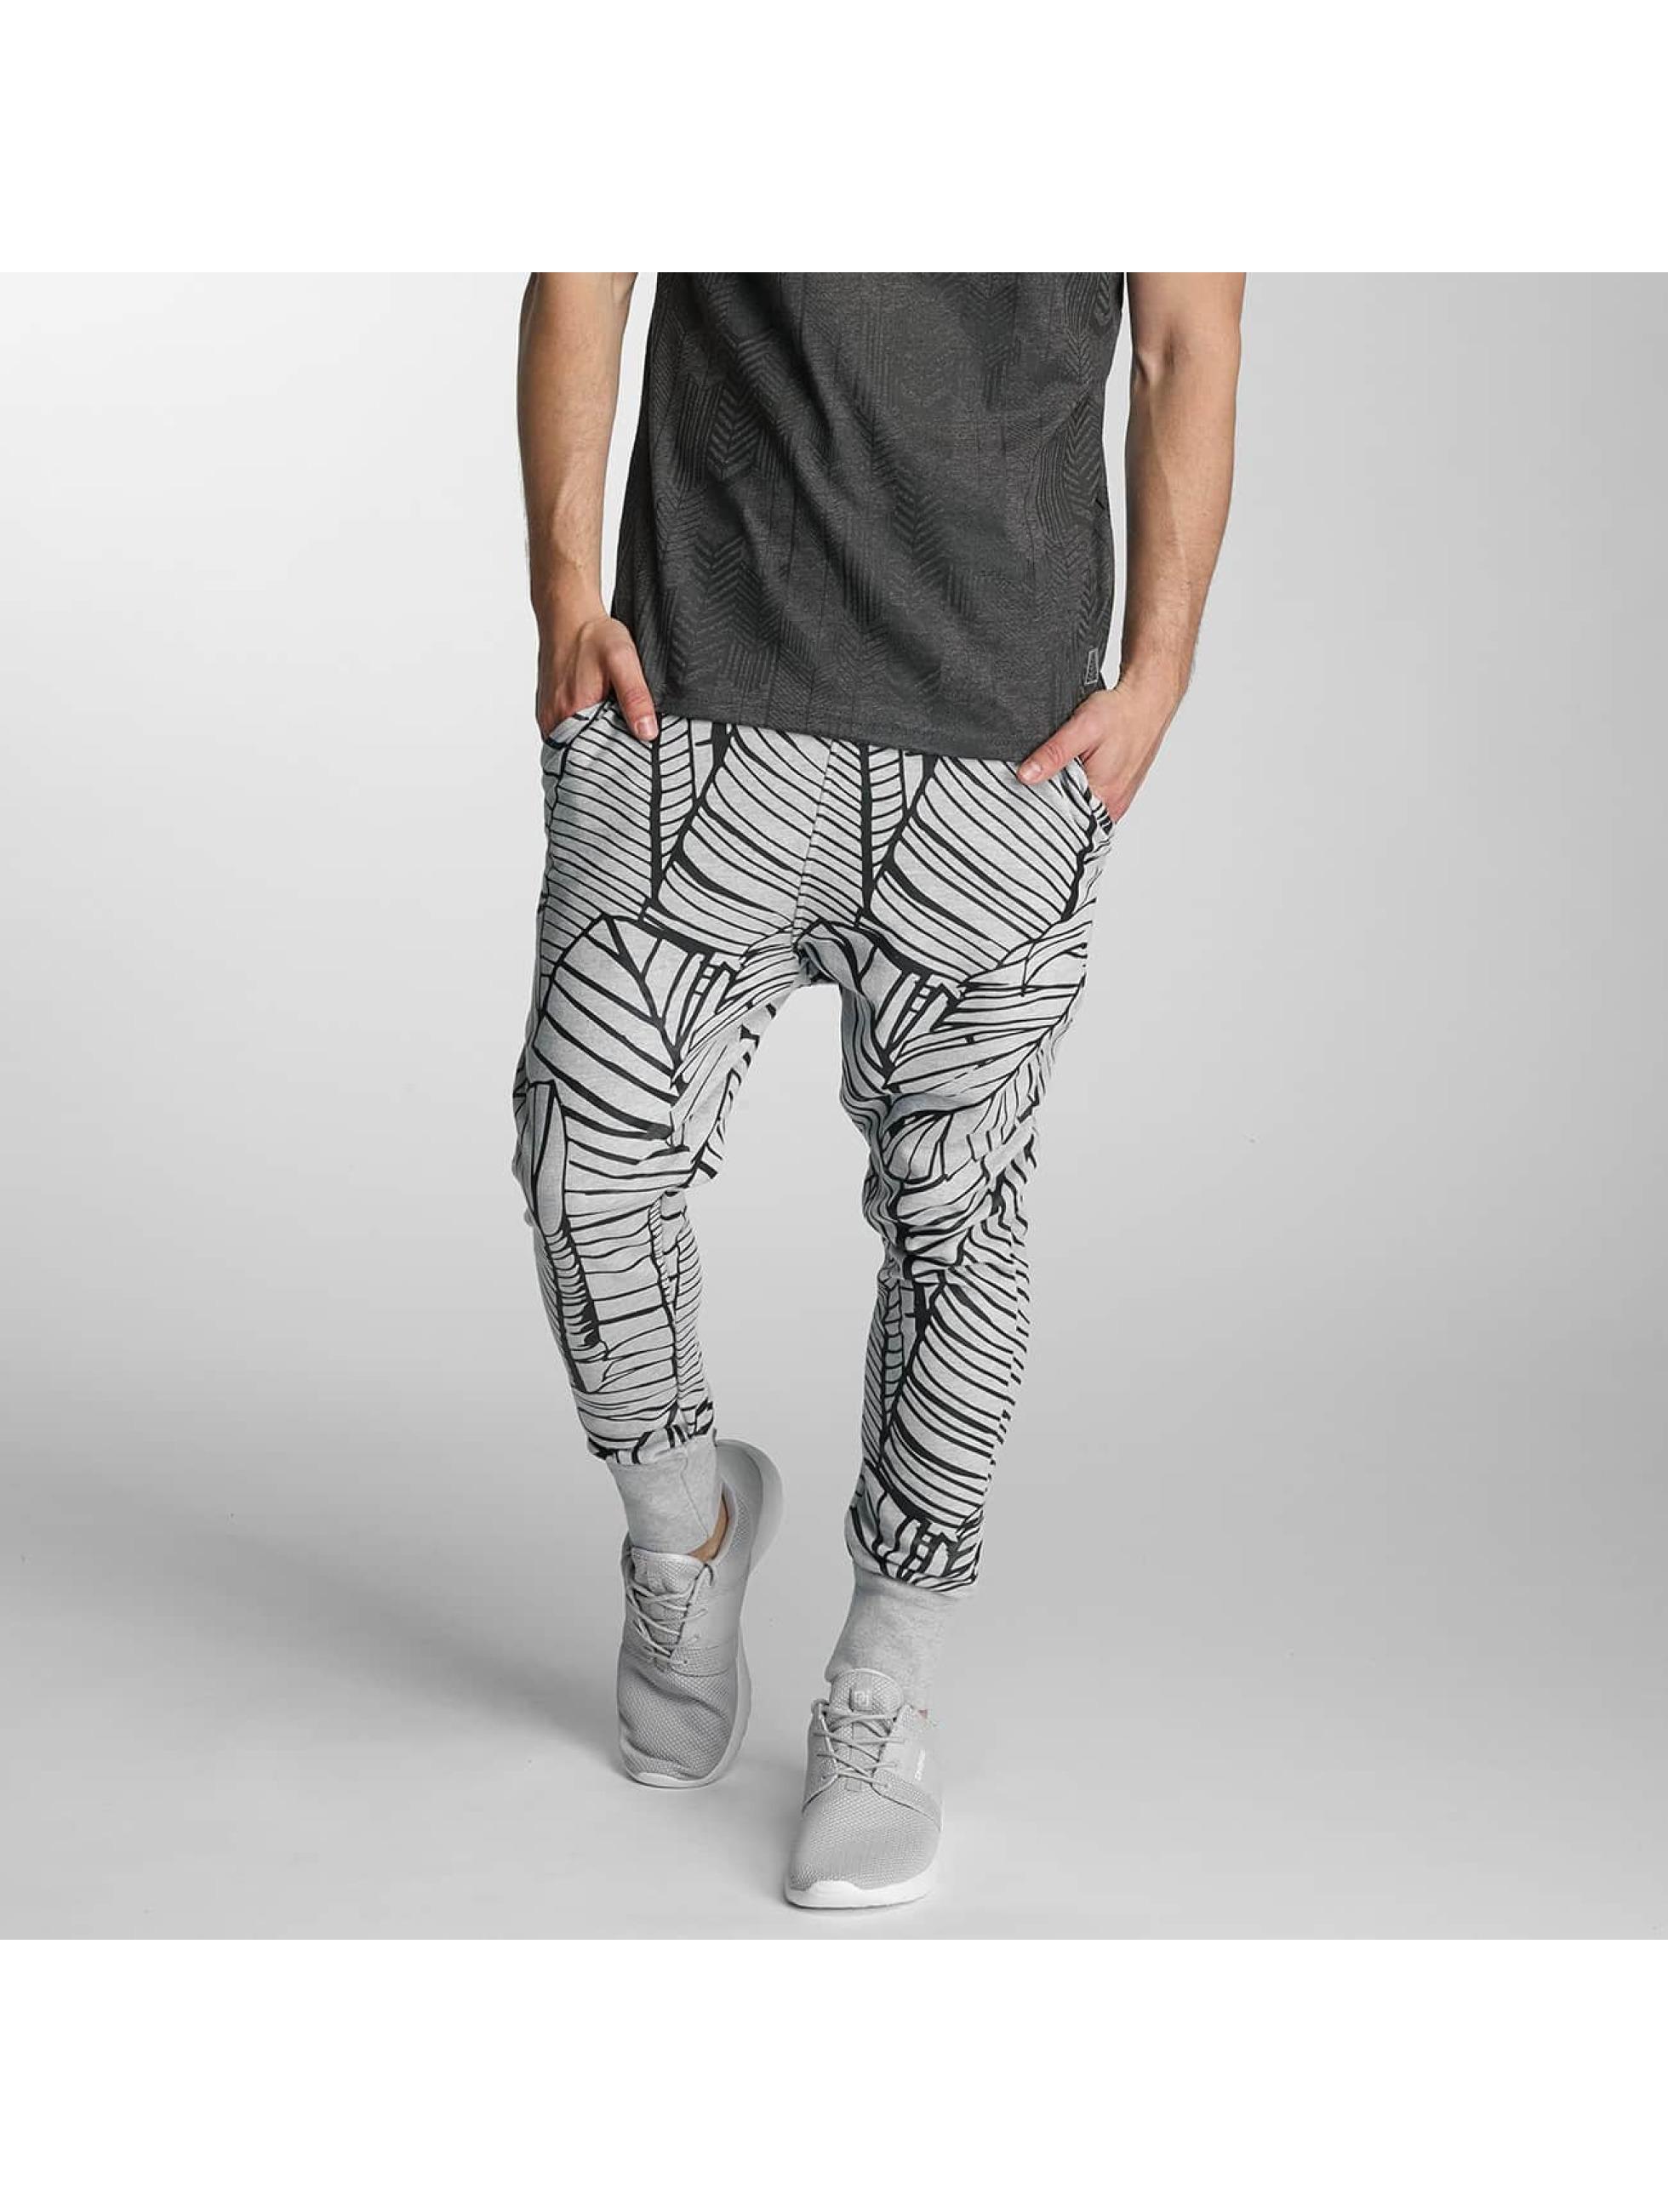 Just Rhyse / Sweat Pant Ocean City in grey XL